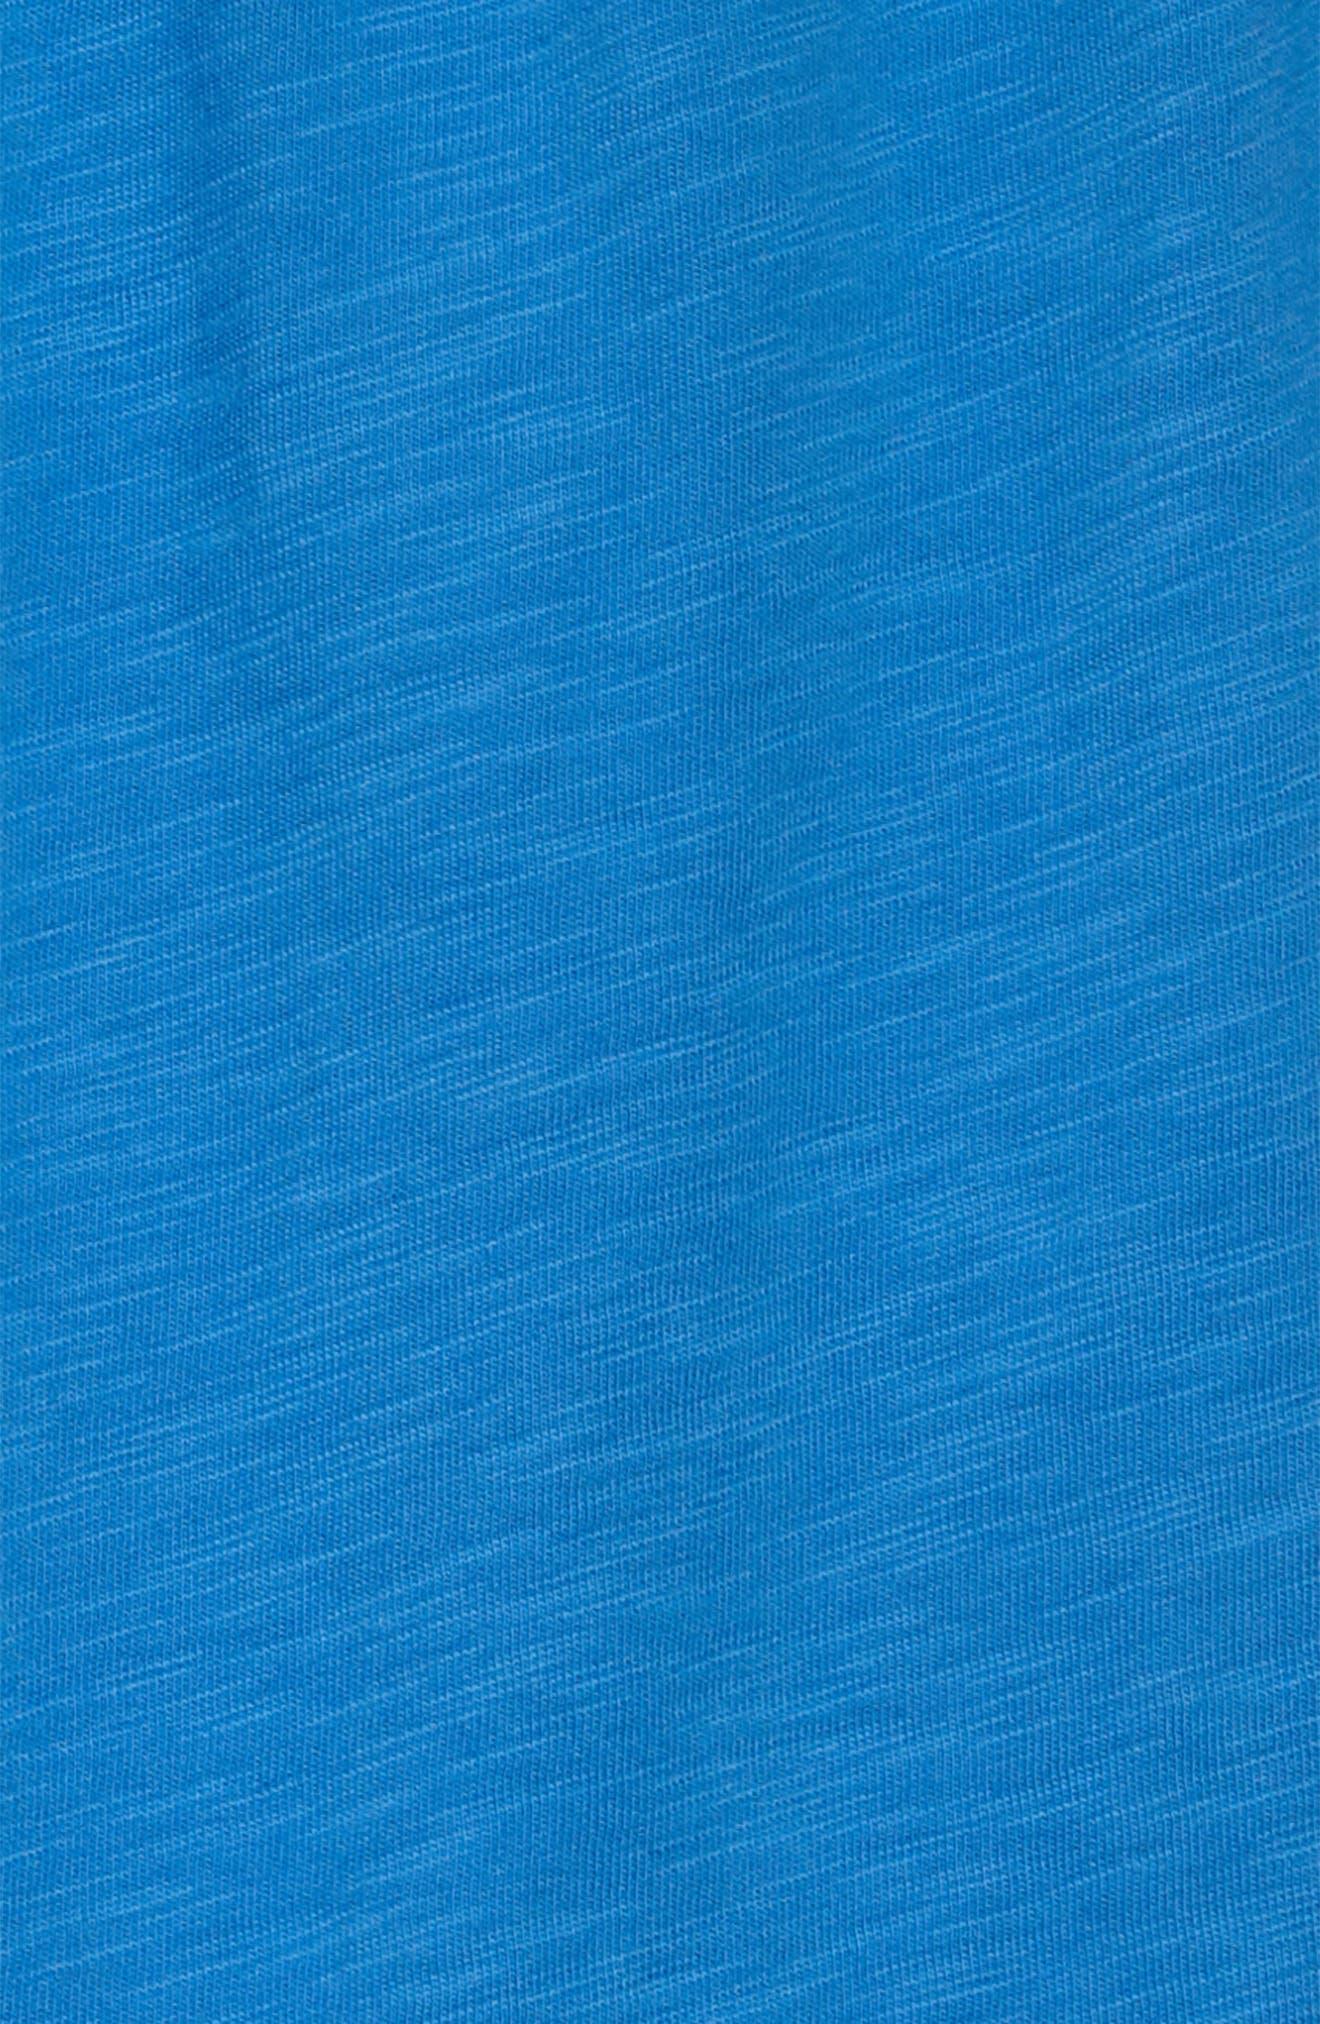 Placket Trim Dress,                             Alternate thumbnail 3, color,                             467